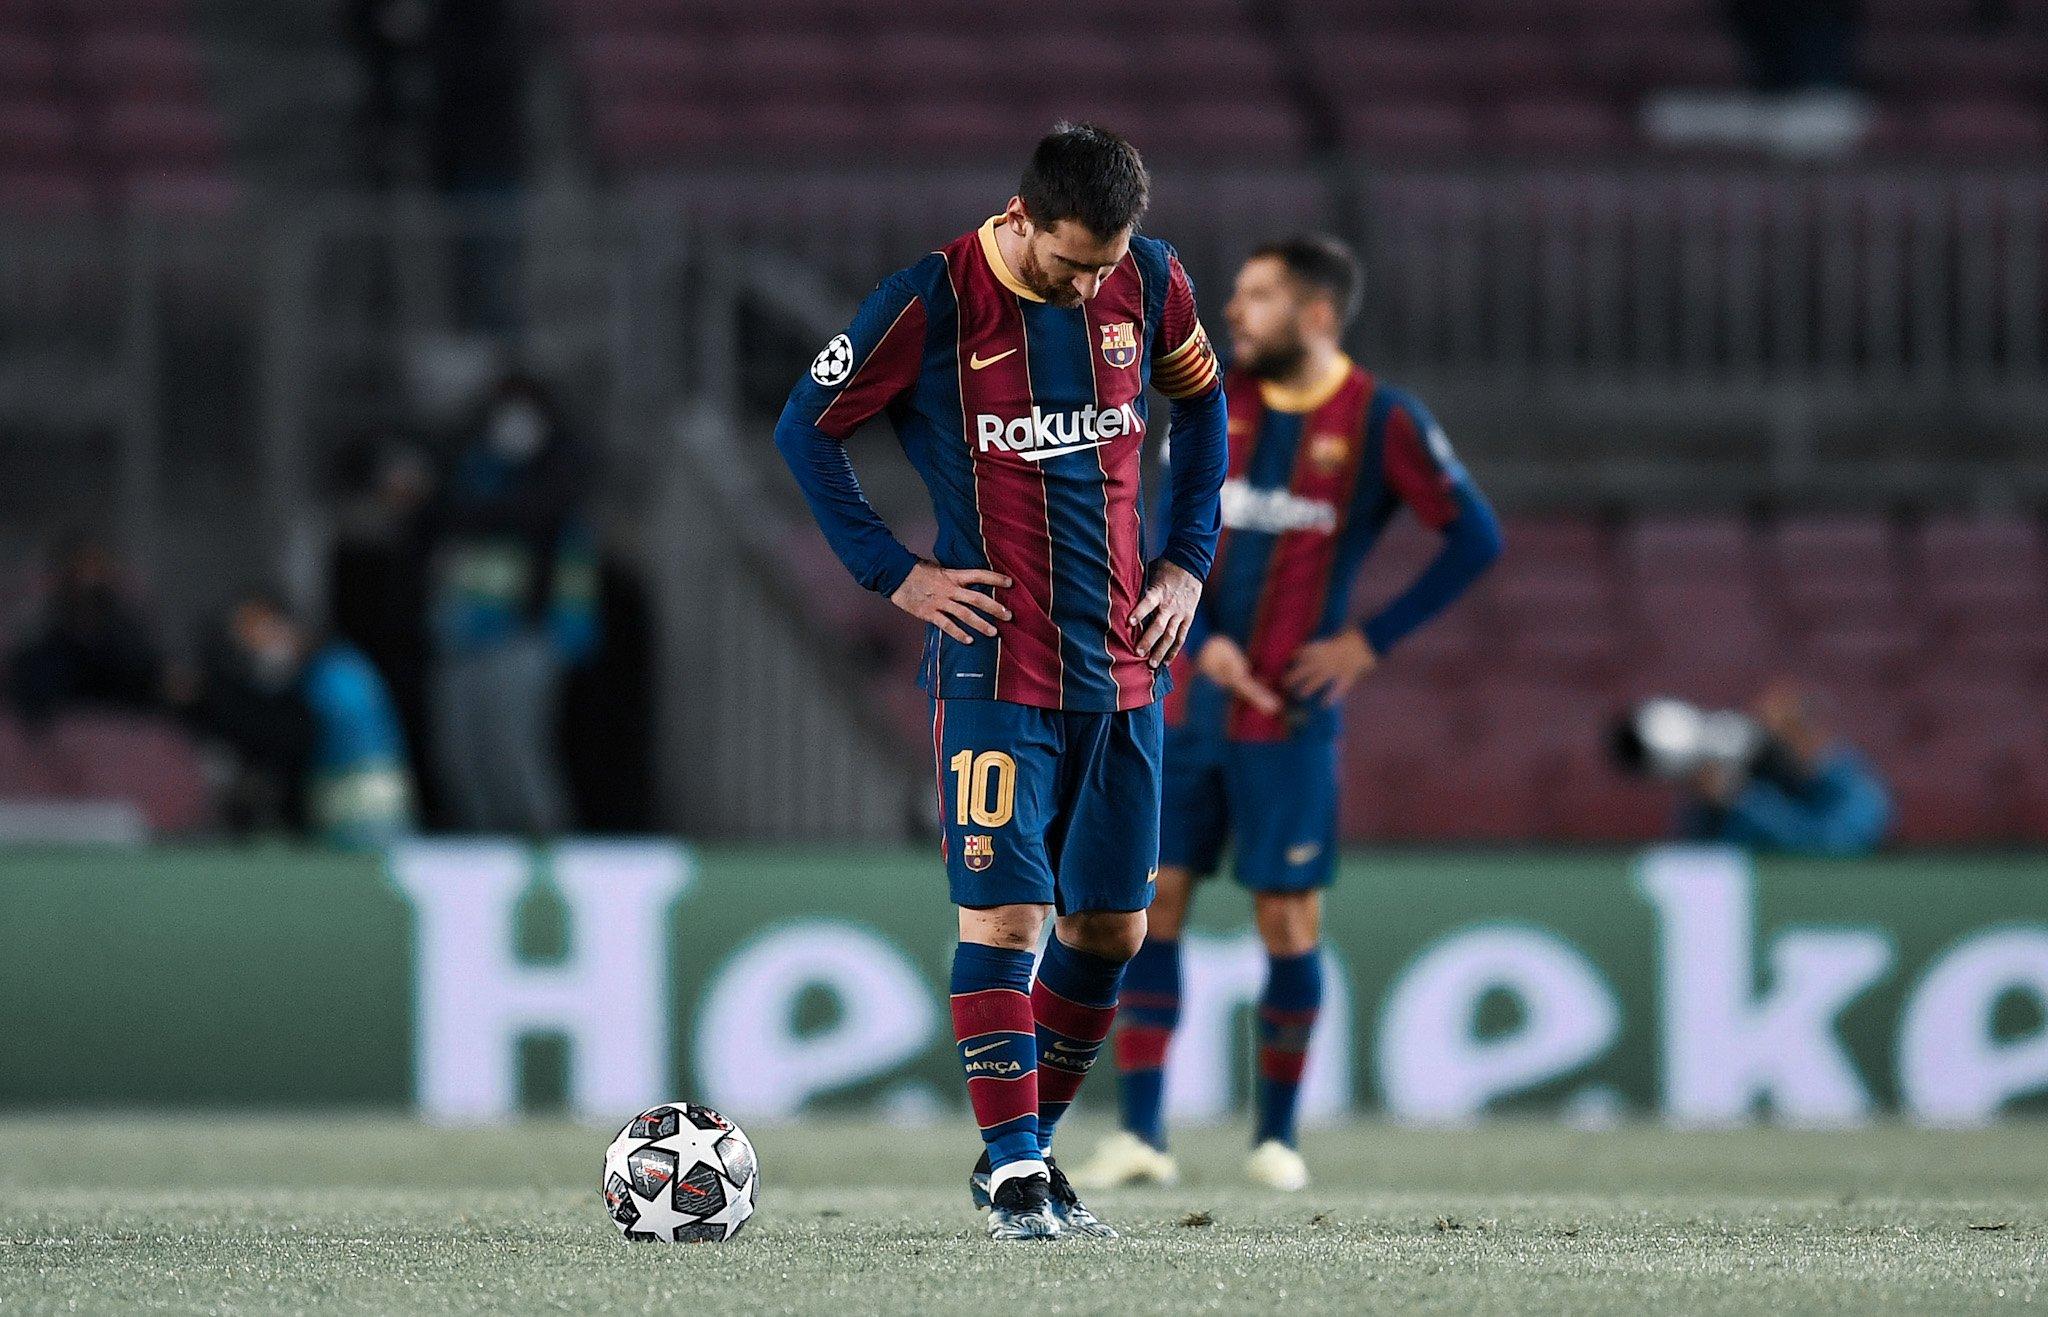 Barcelona 1-4 PSG, Match Review: Mbappe hattrick ends Barça | Barca  Universal